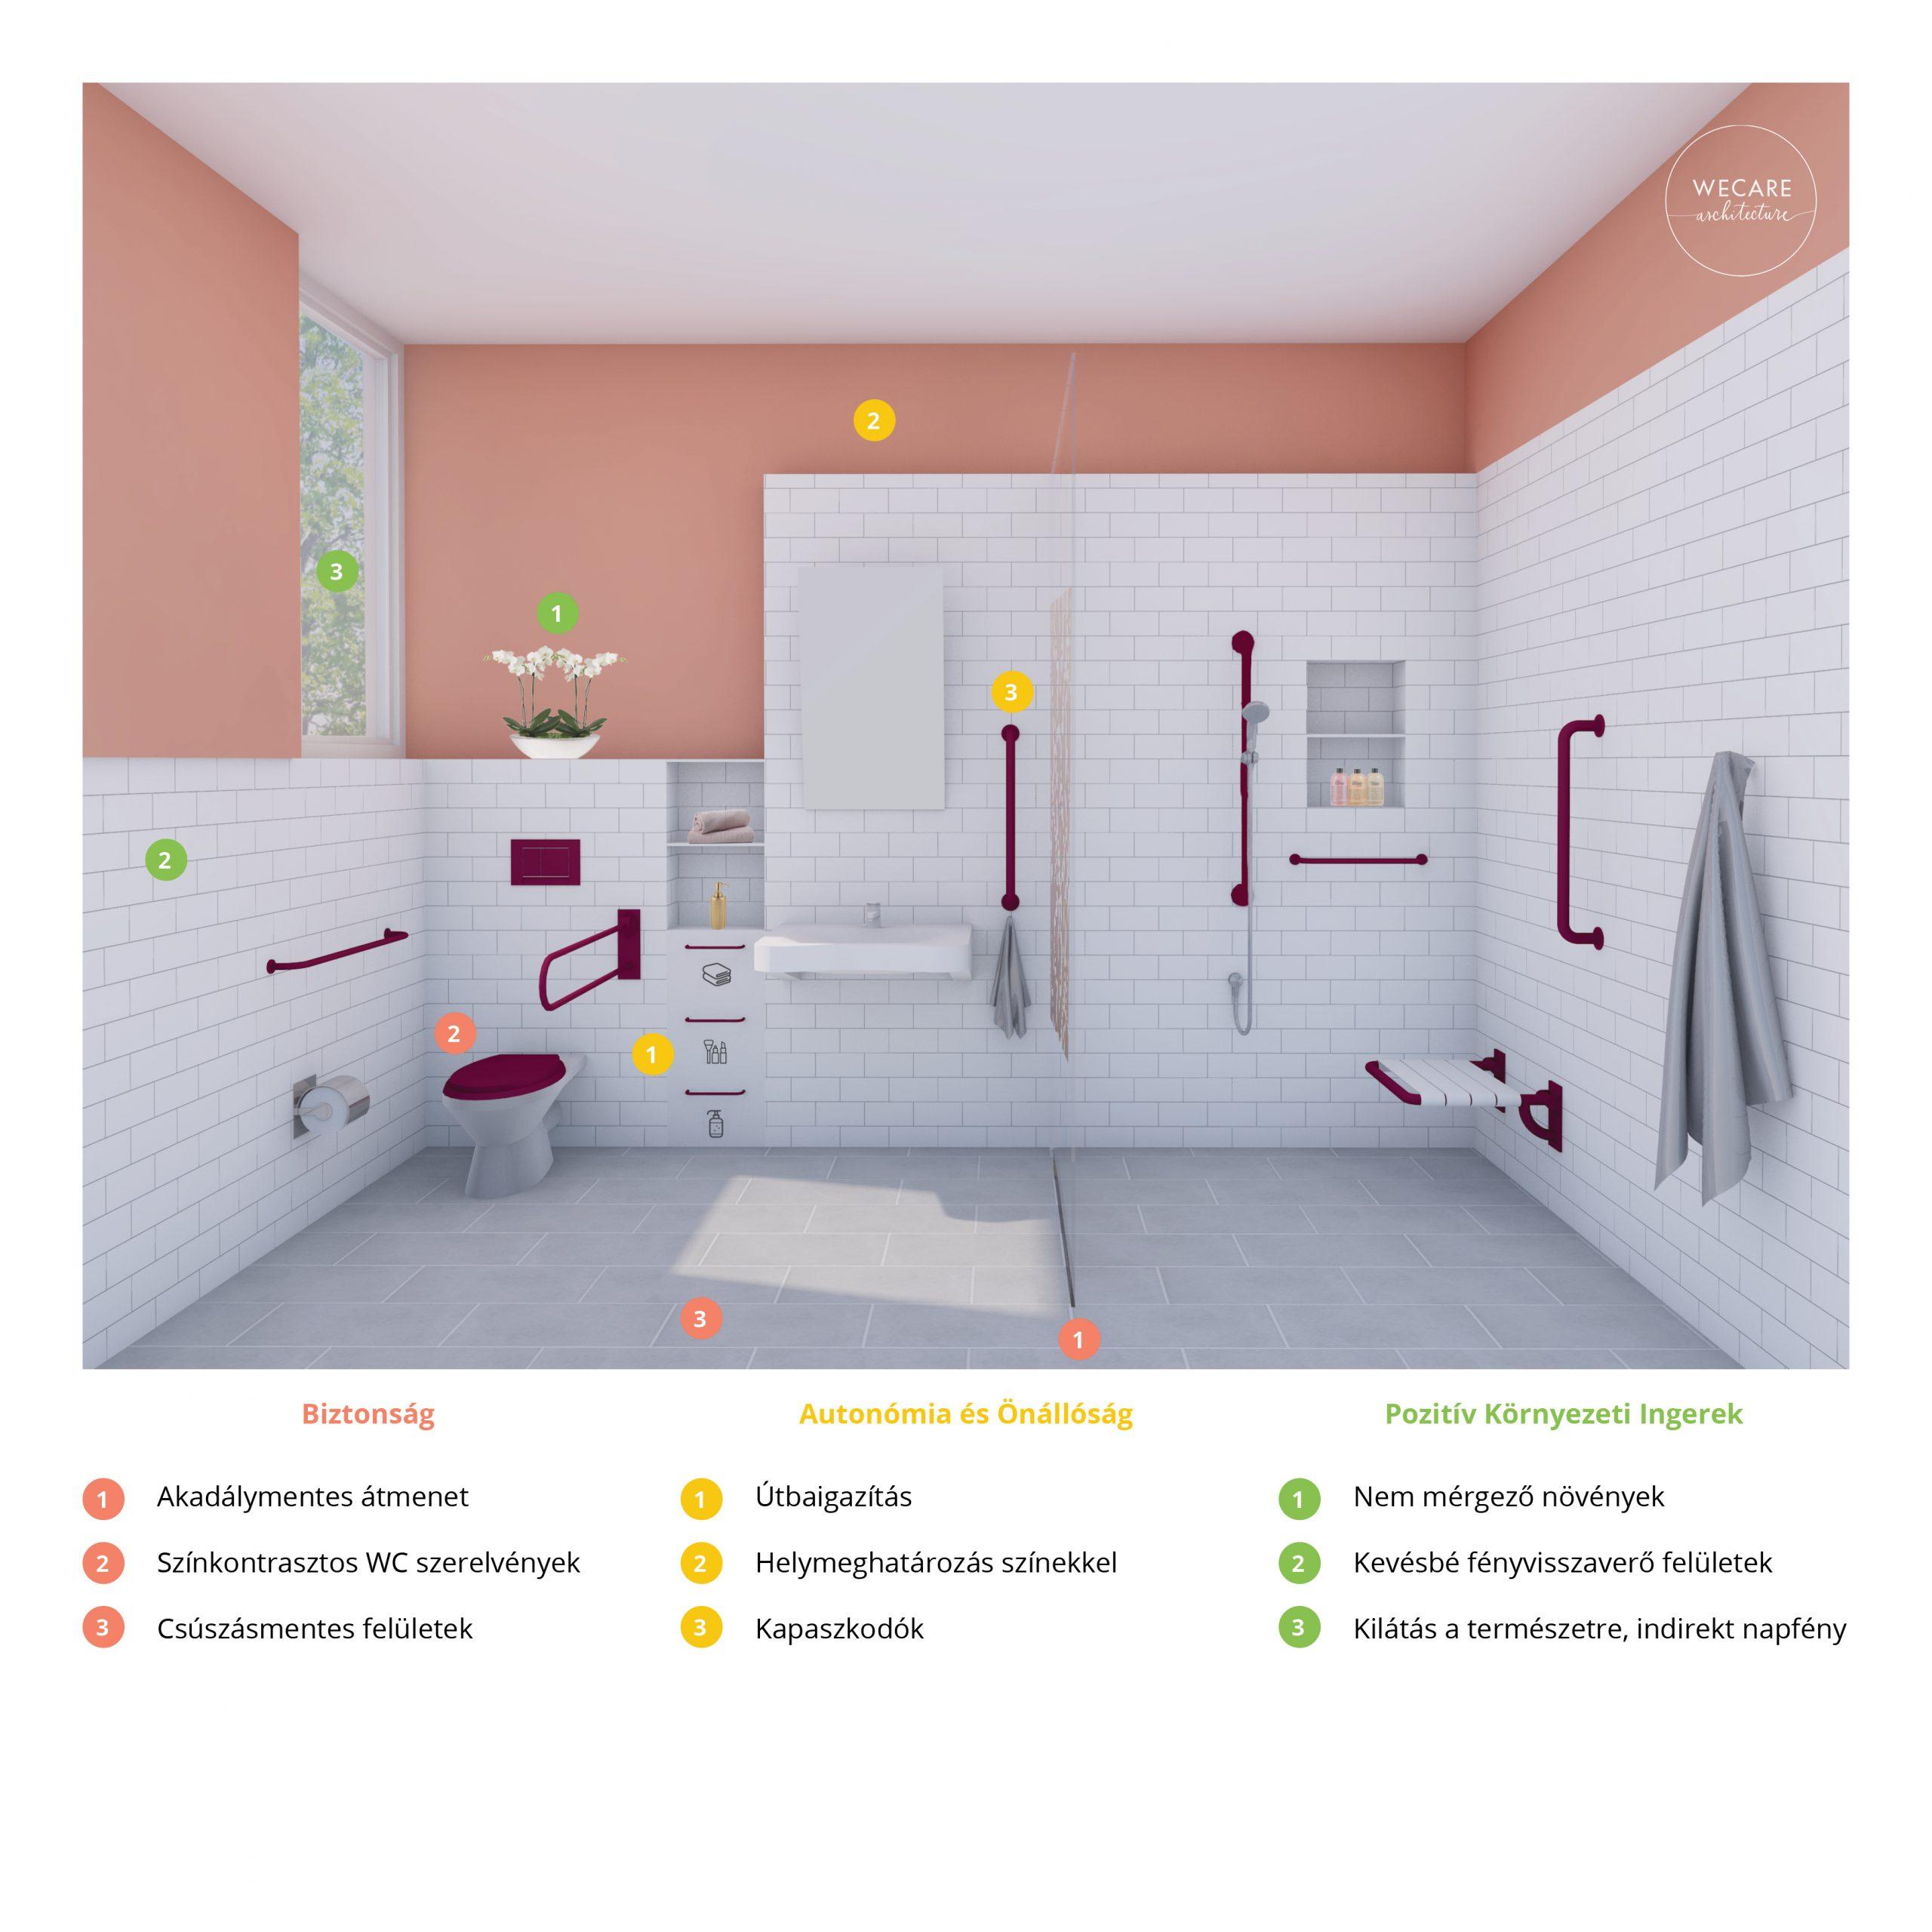 WeCare Demenciabarat fürdőszoba